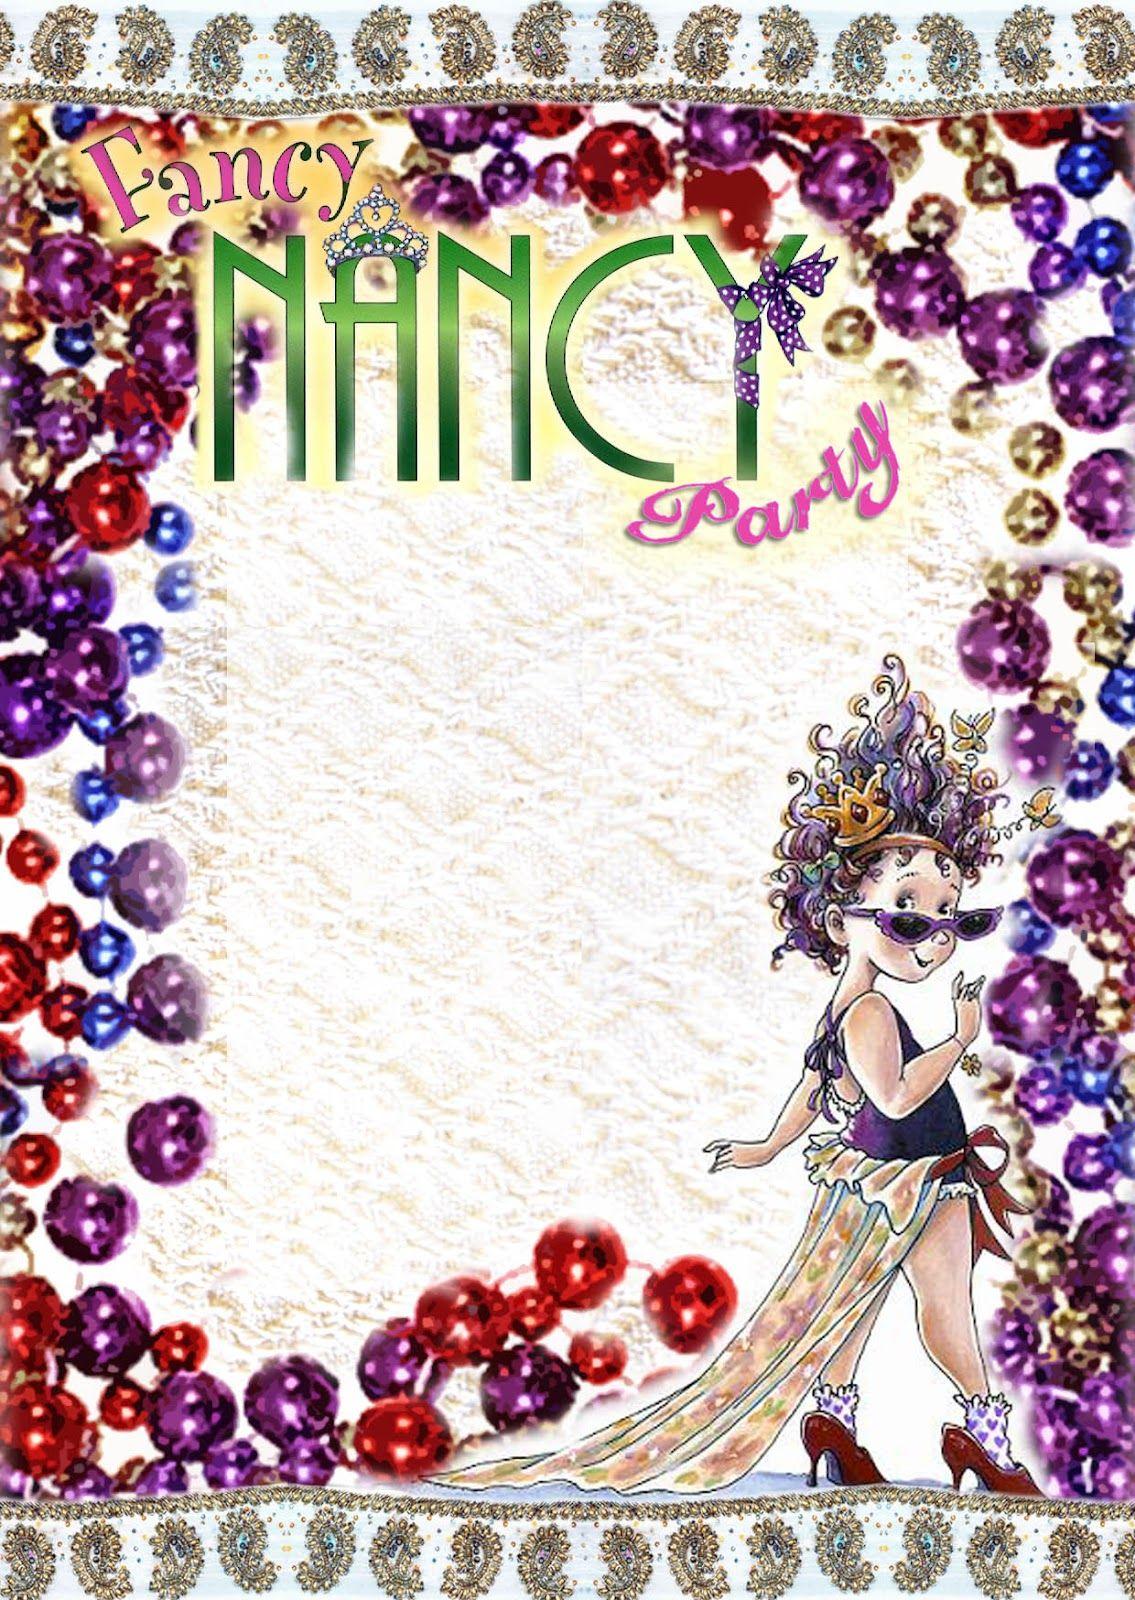 FREE Kids Party Invitations: Fancy Nancy Printable Invitation *NEW ...